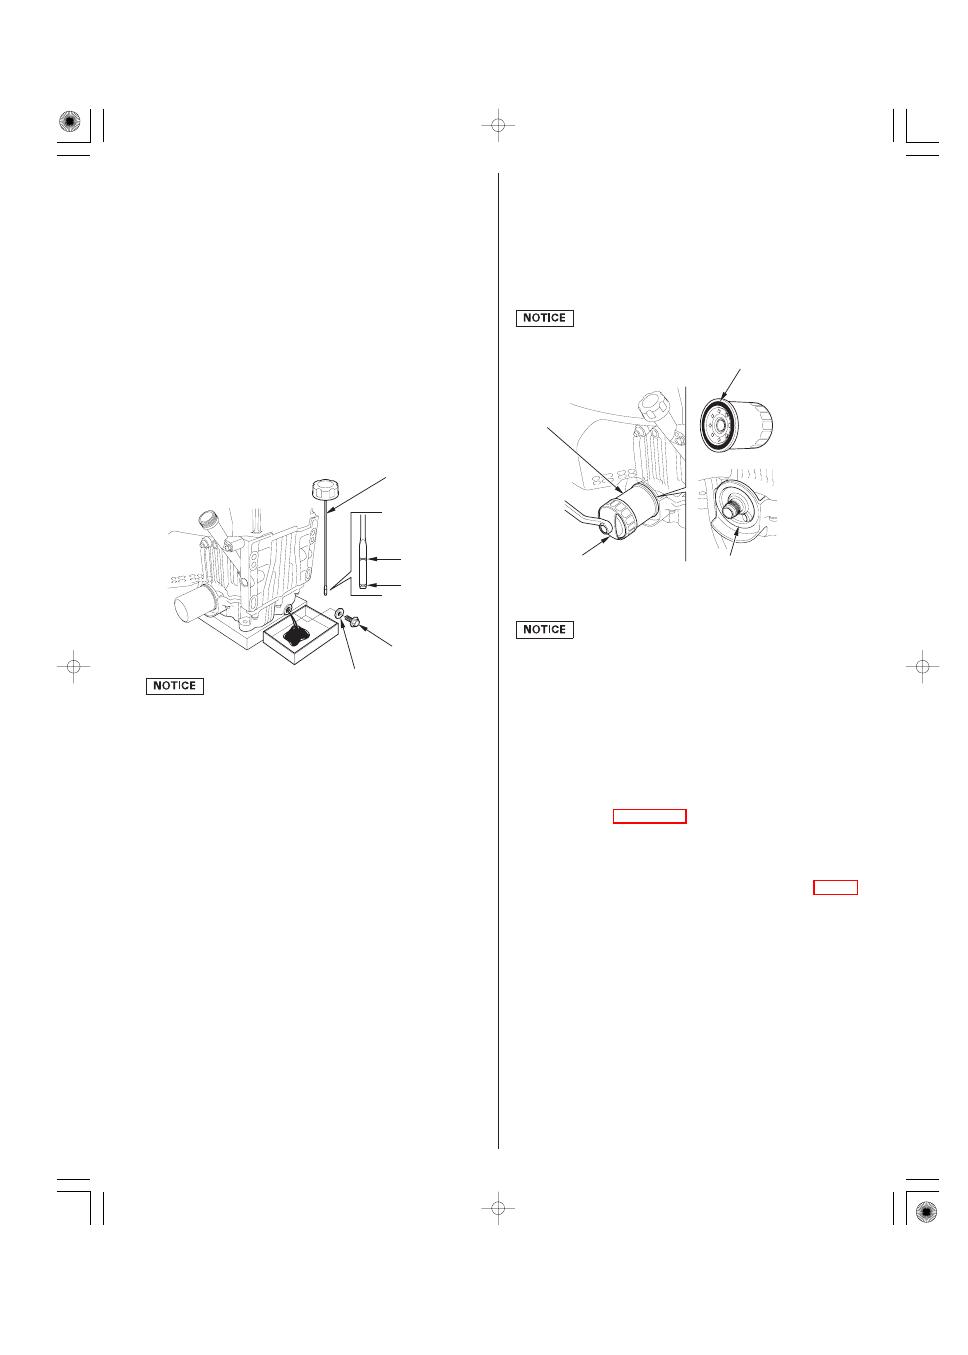 Honda Pcx Manual Zip Ebook Circuits 8085 Projects Blog Archive Analog Cricket Sounds Circuit Array Gx270 90 Rh Zettadata Solutions